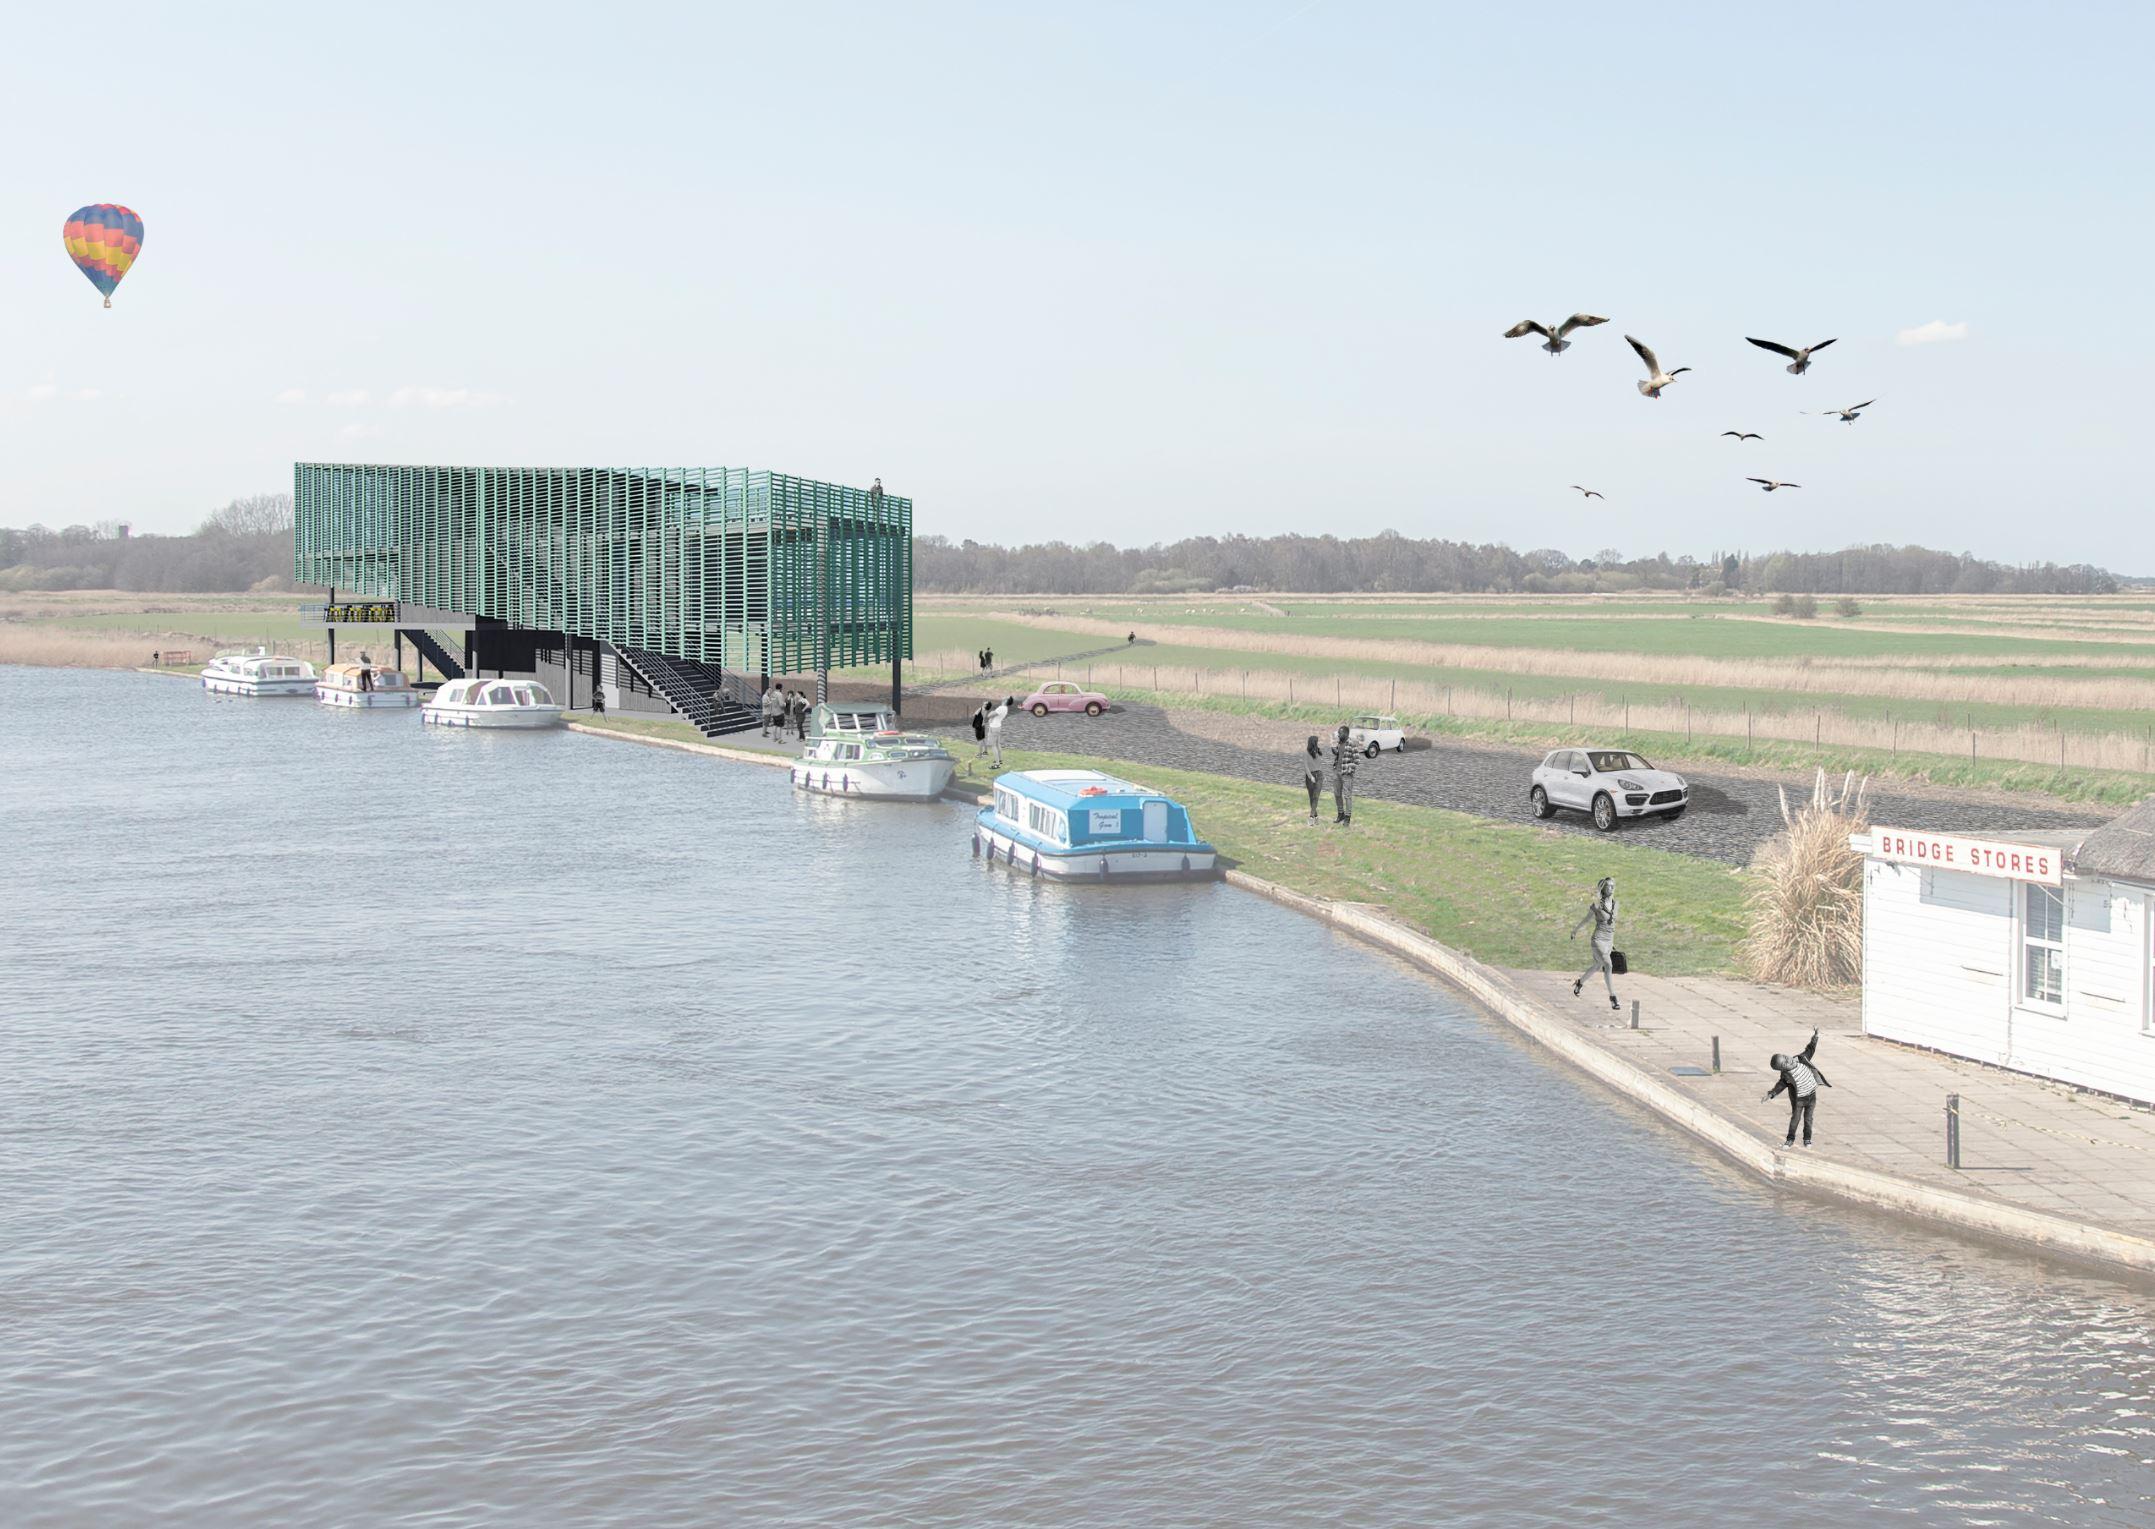 Tall Architects - Acle Bridge - England